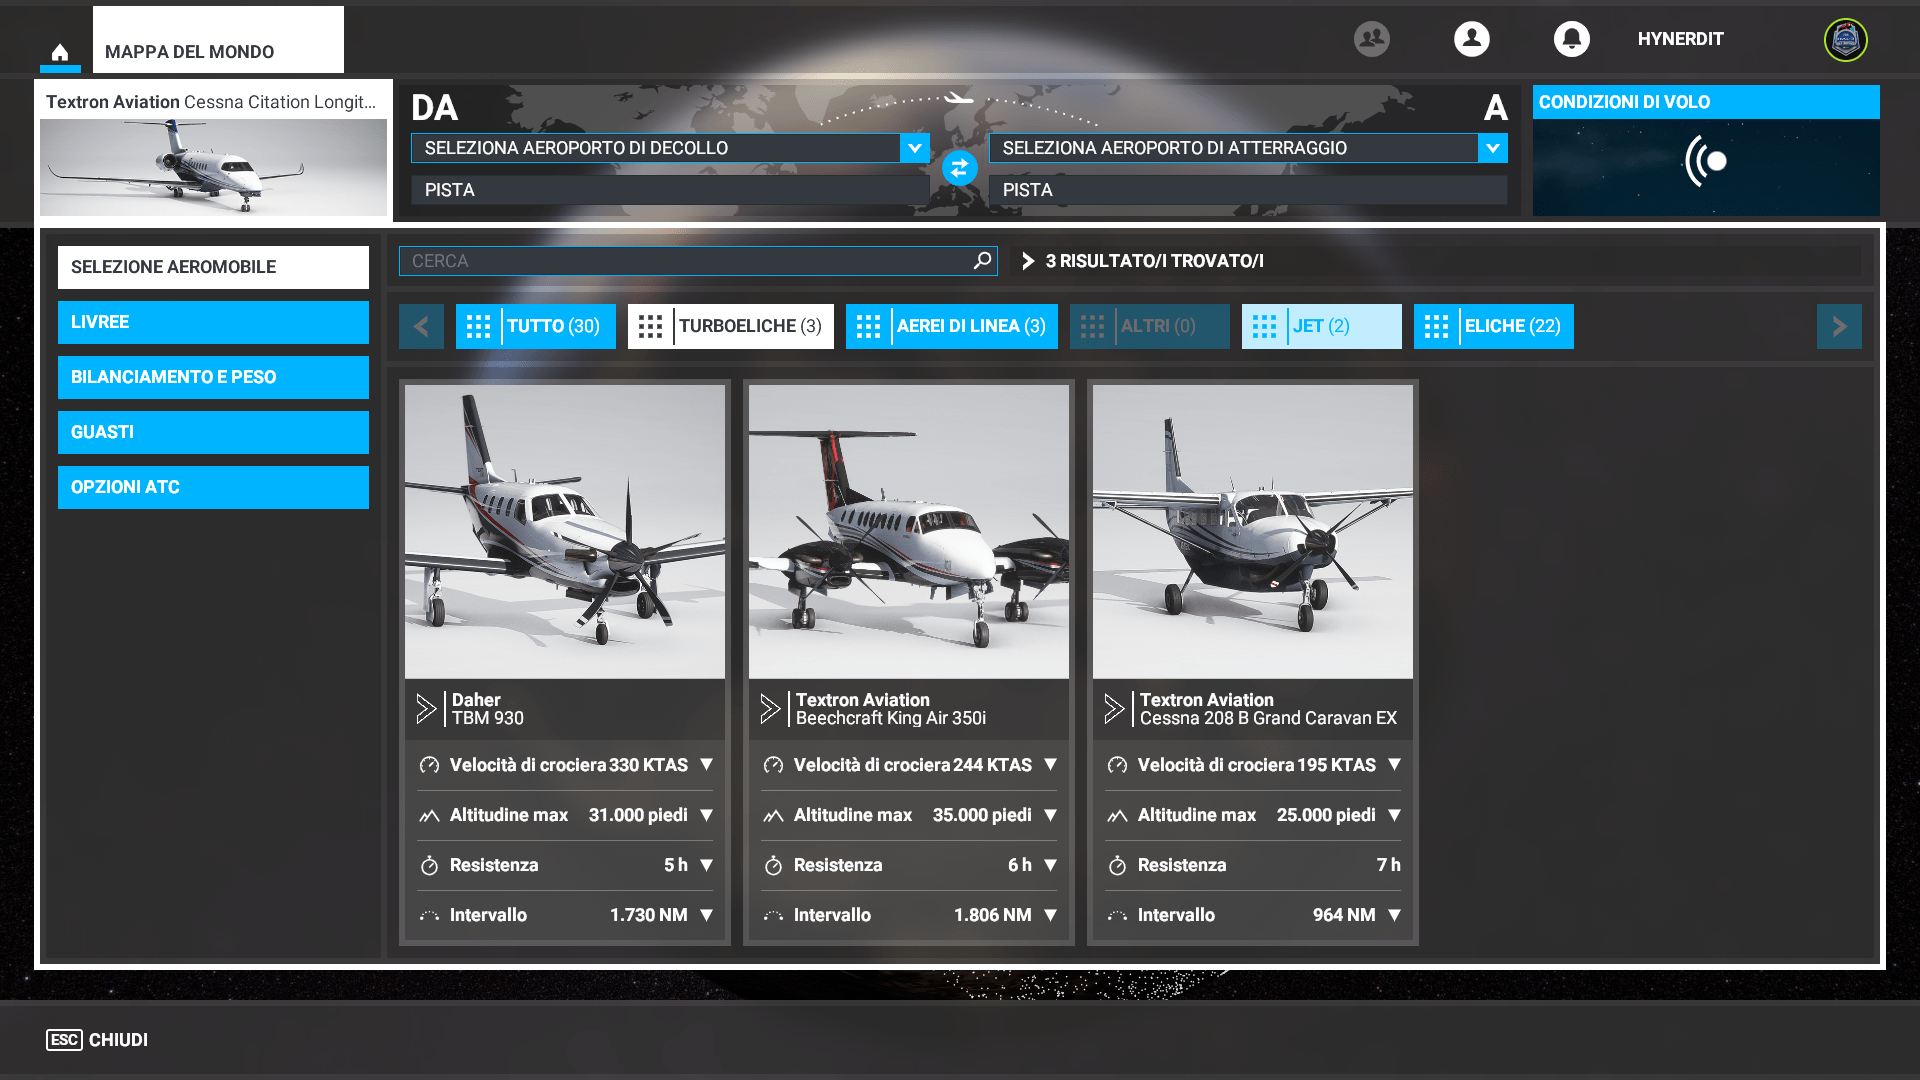 Microsoft Flight Simulator 2020: La Recensione 7 - Hynerd.it